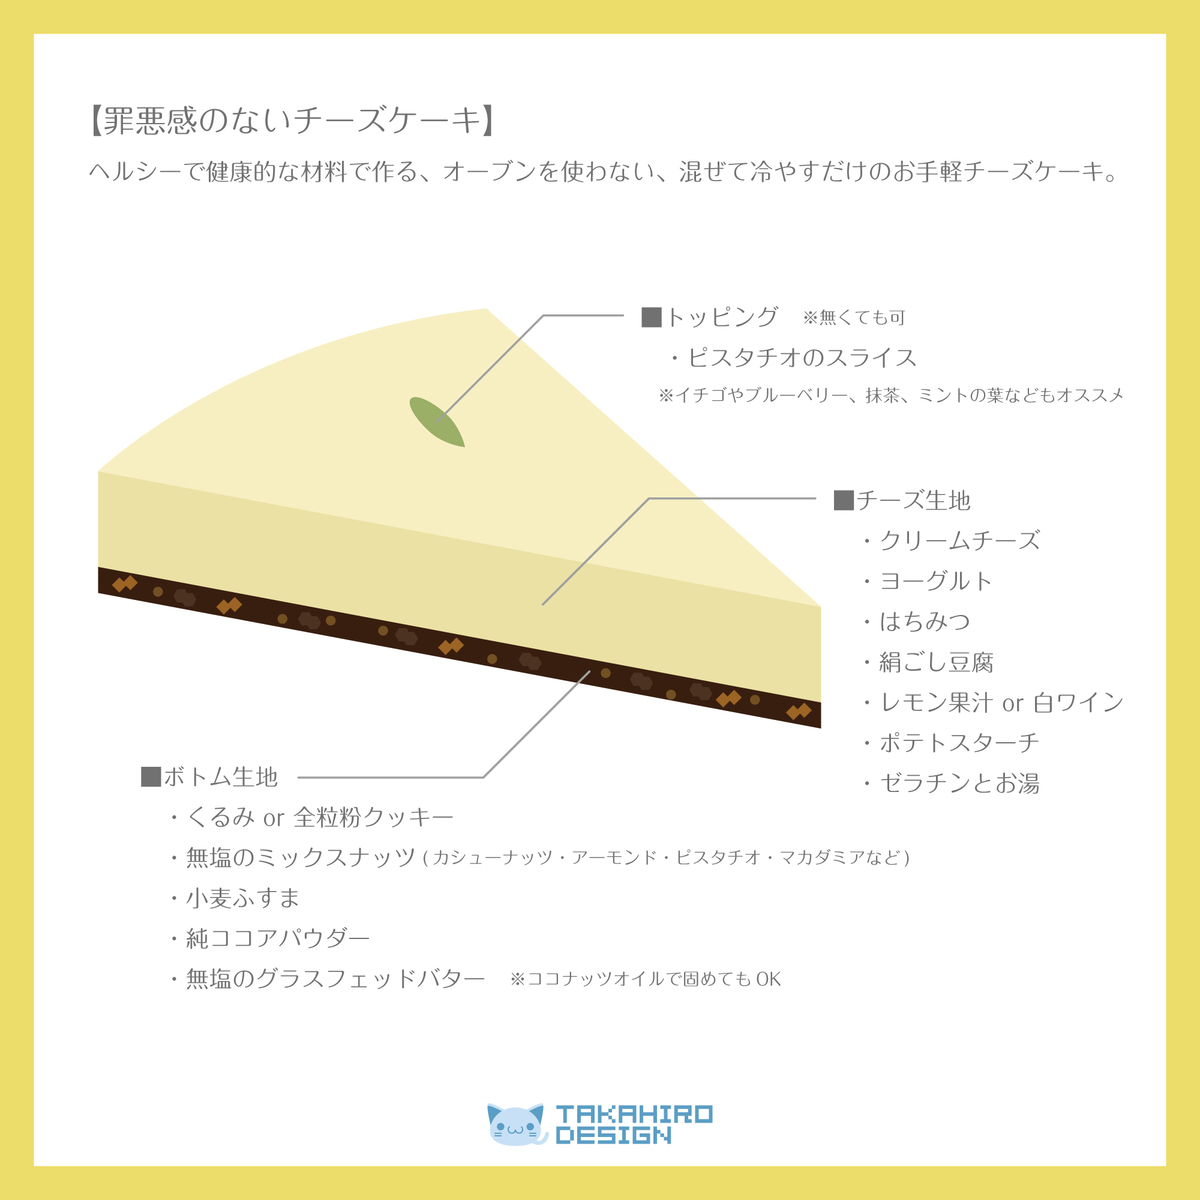 f:id:takahiro-design:20200412132334j:plain